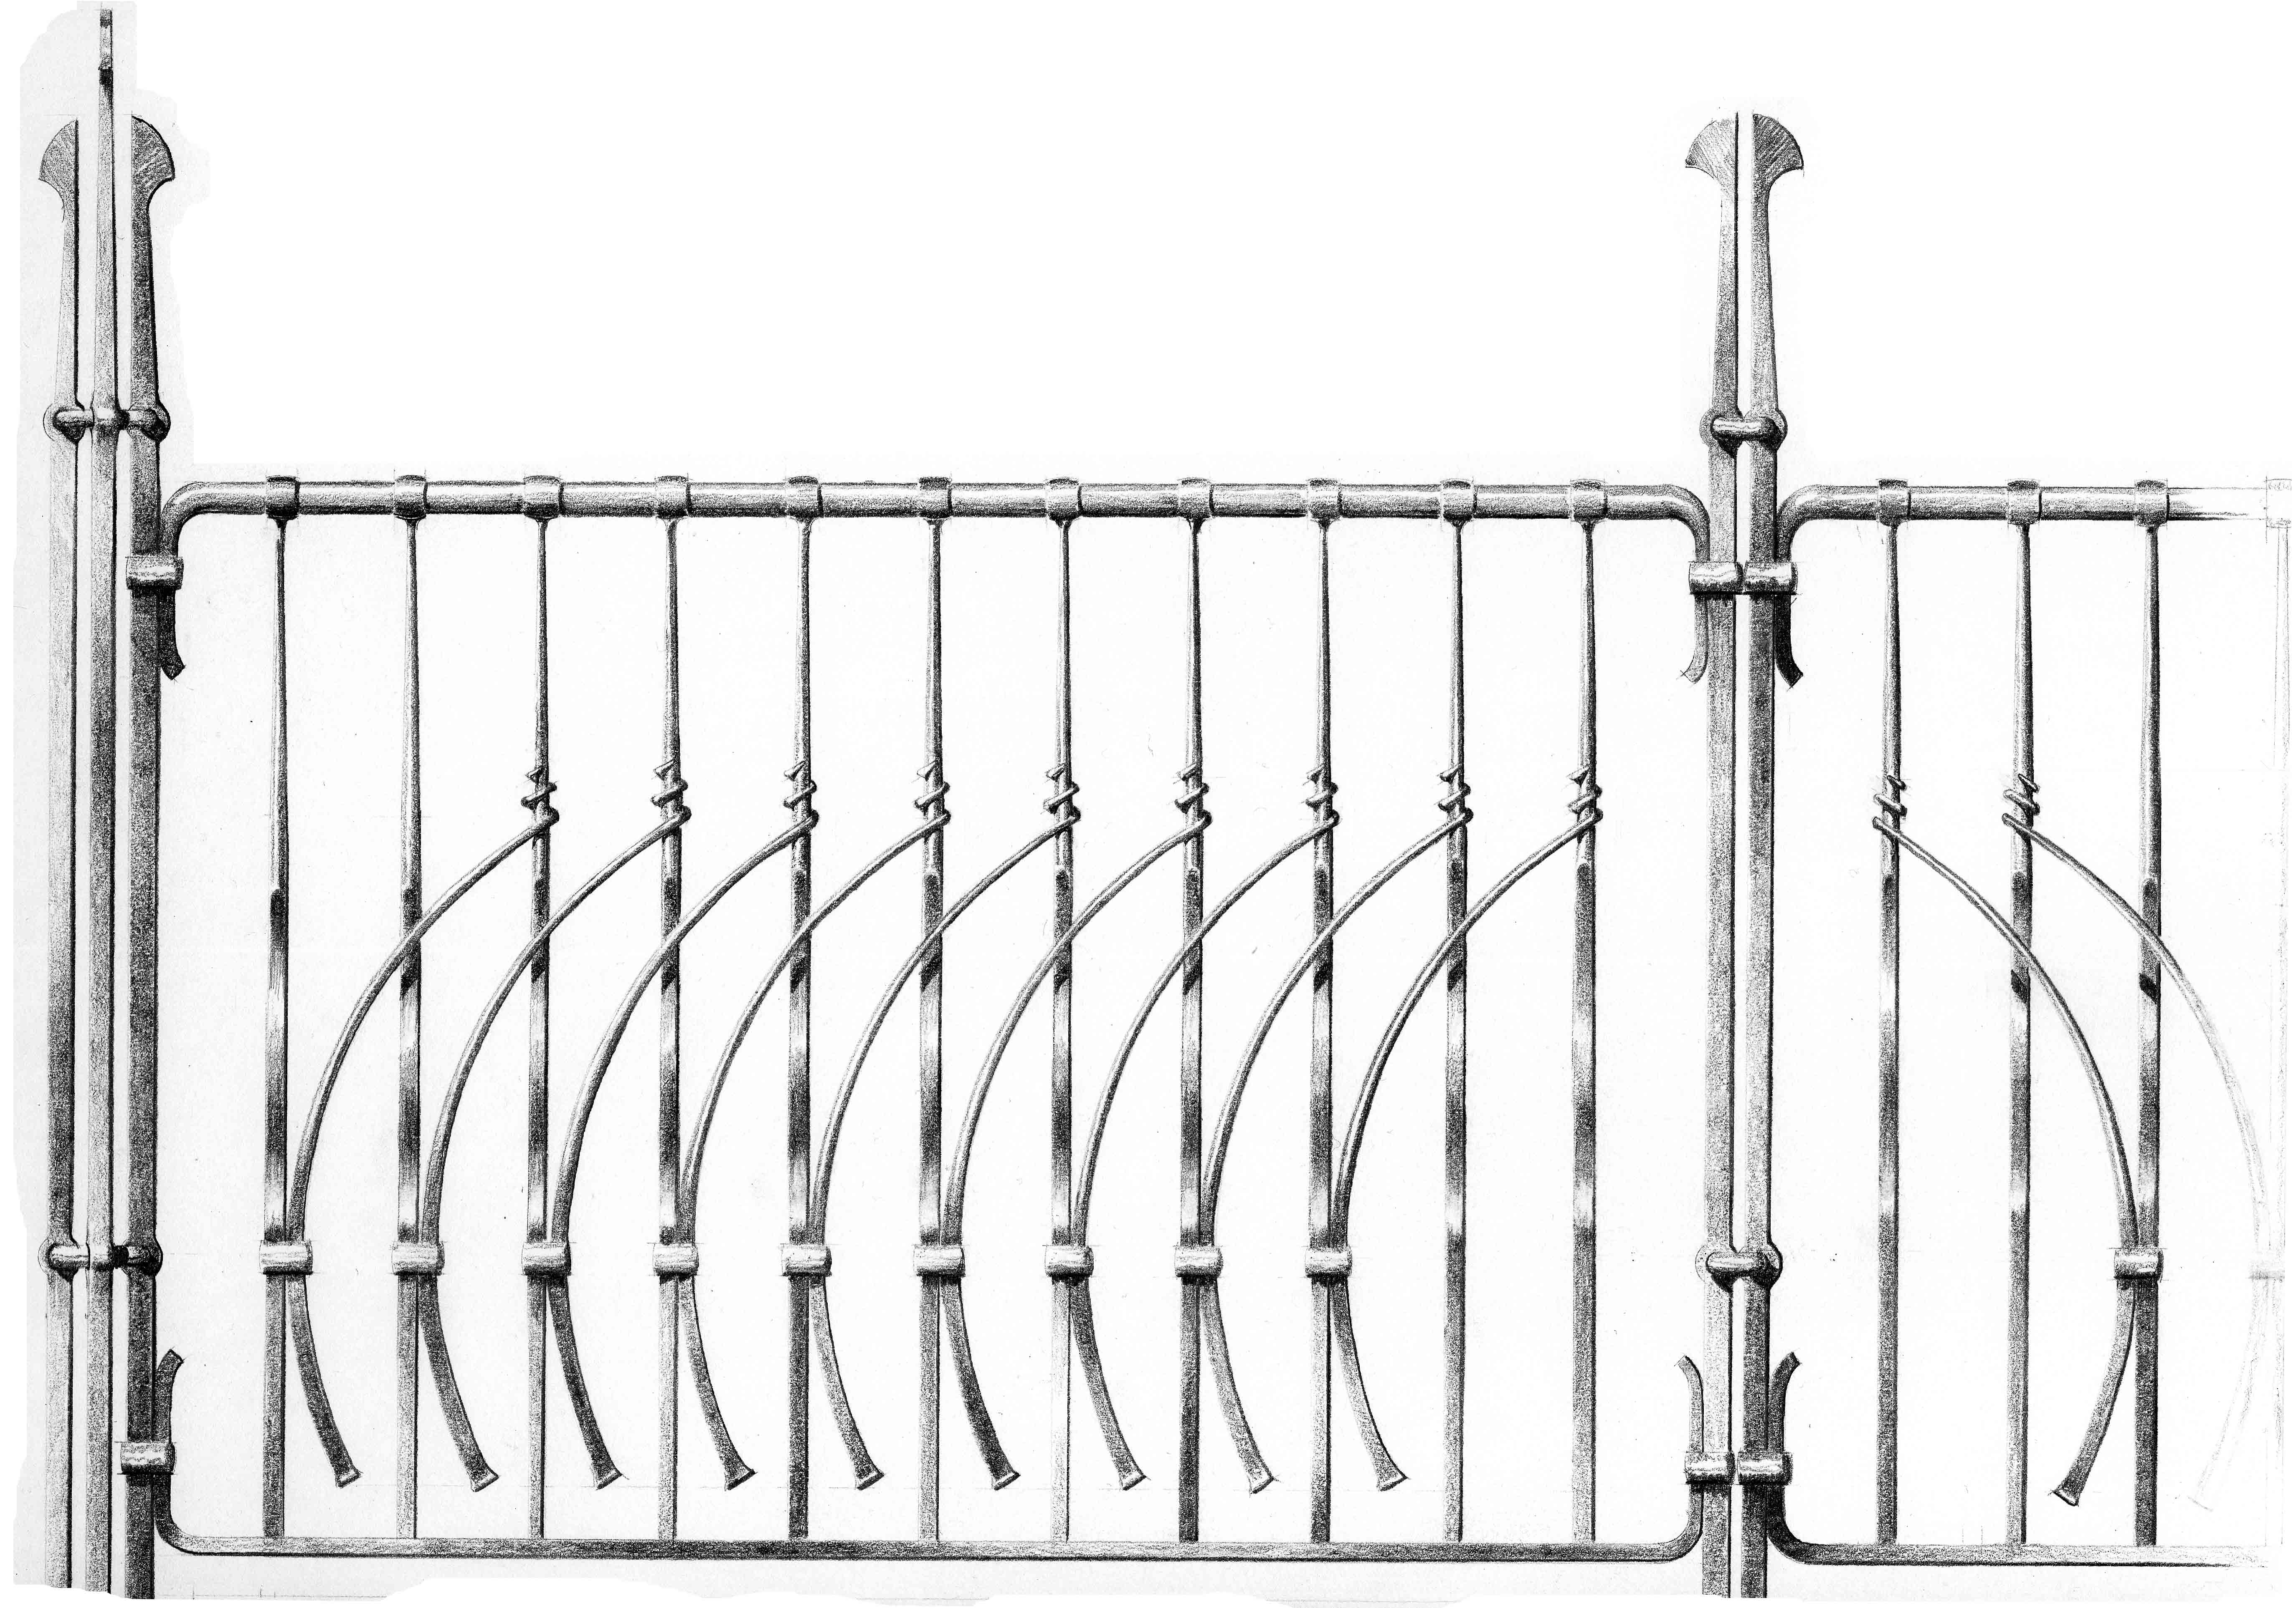 Swadlincote railings drg